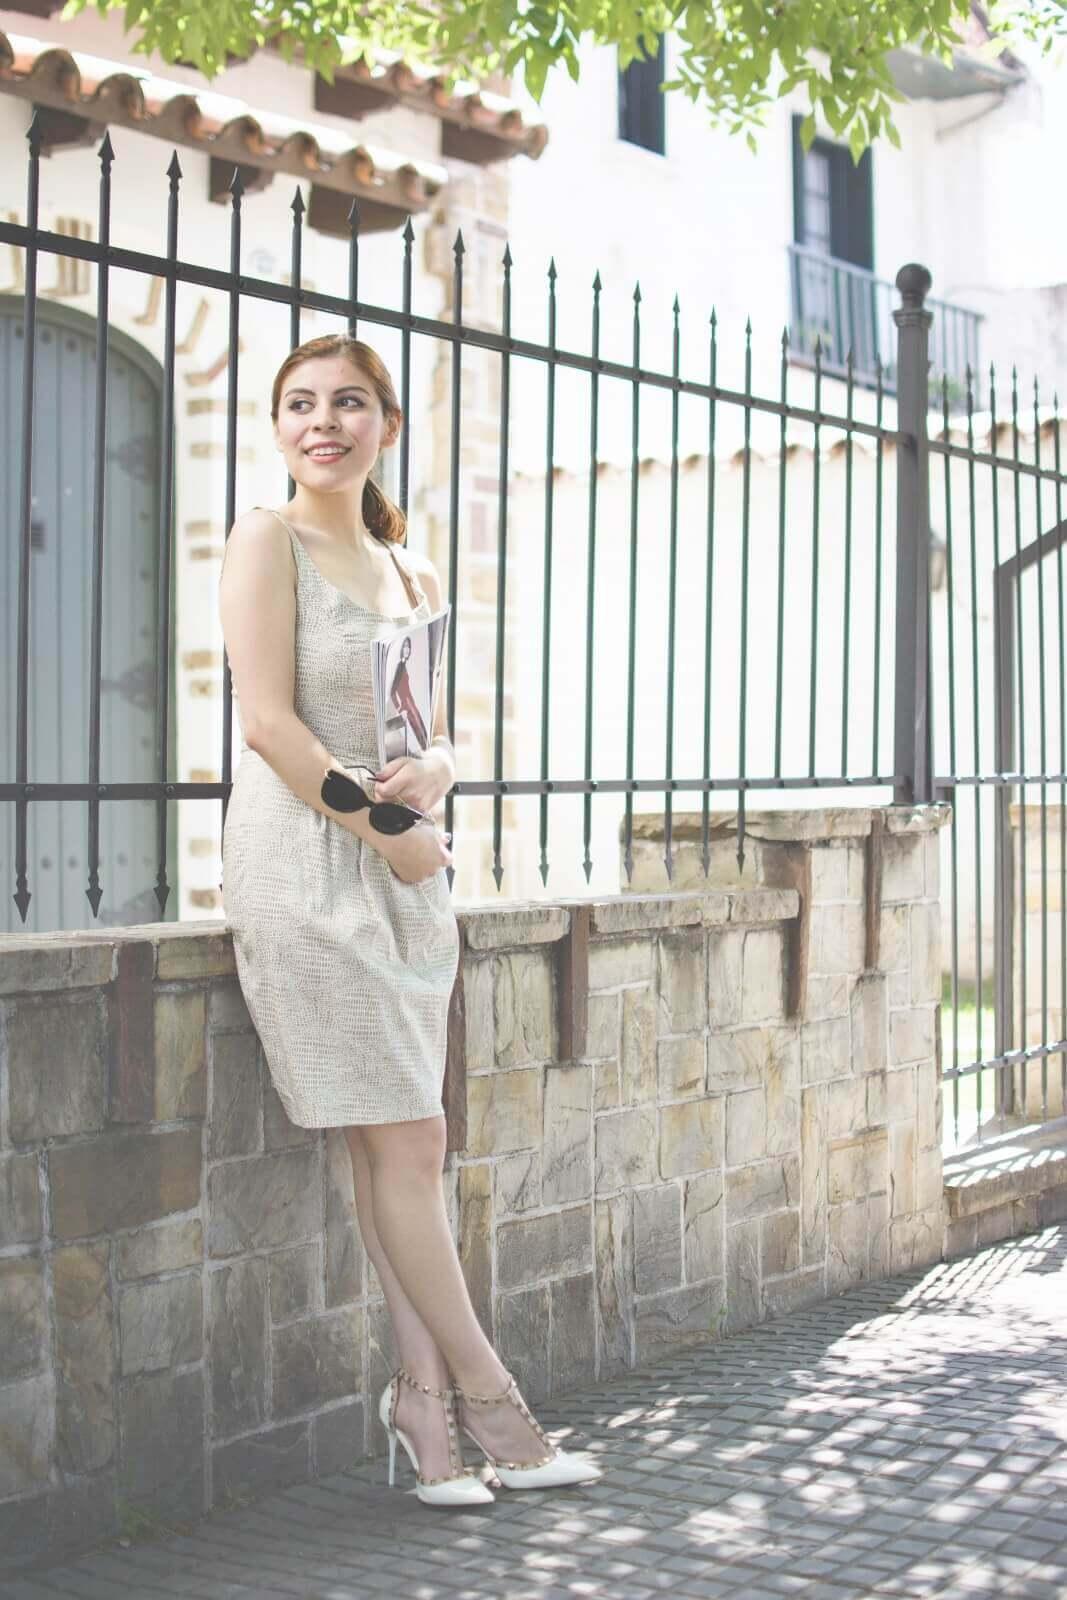 almond-white-dress-sammydress-stilettos-valentino-rockstud-imitation-deborah-ferrero-style-by-deb-ladylike11